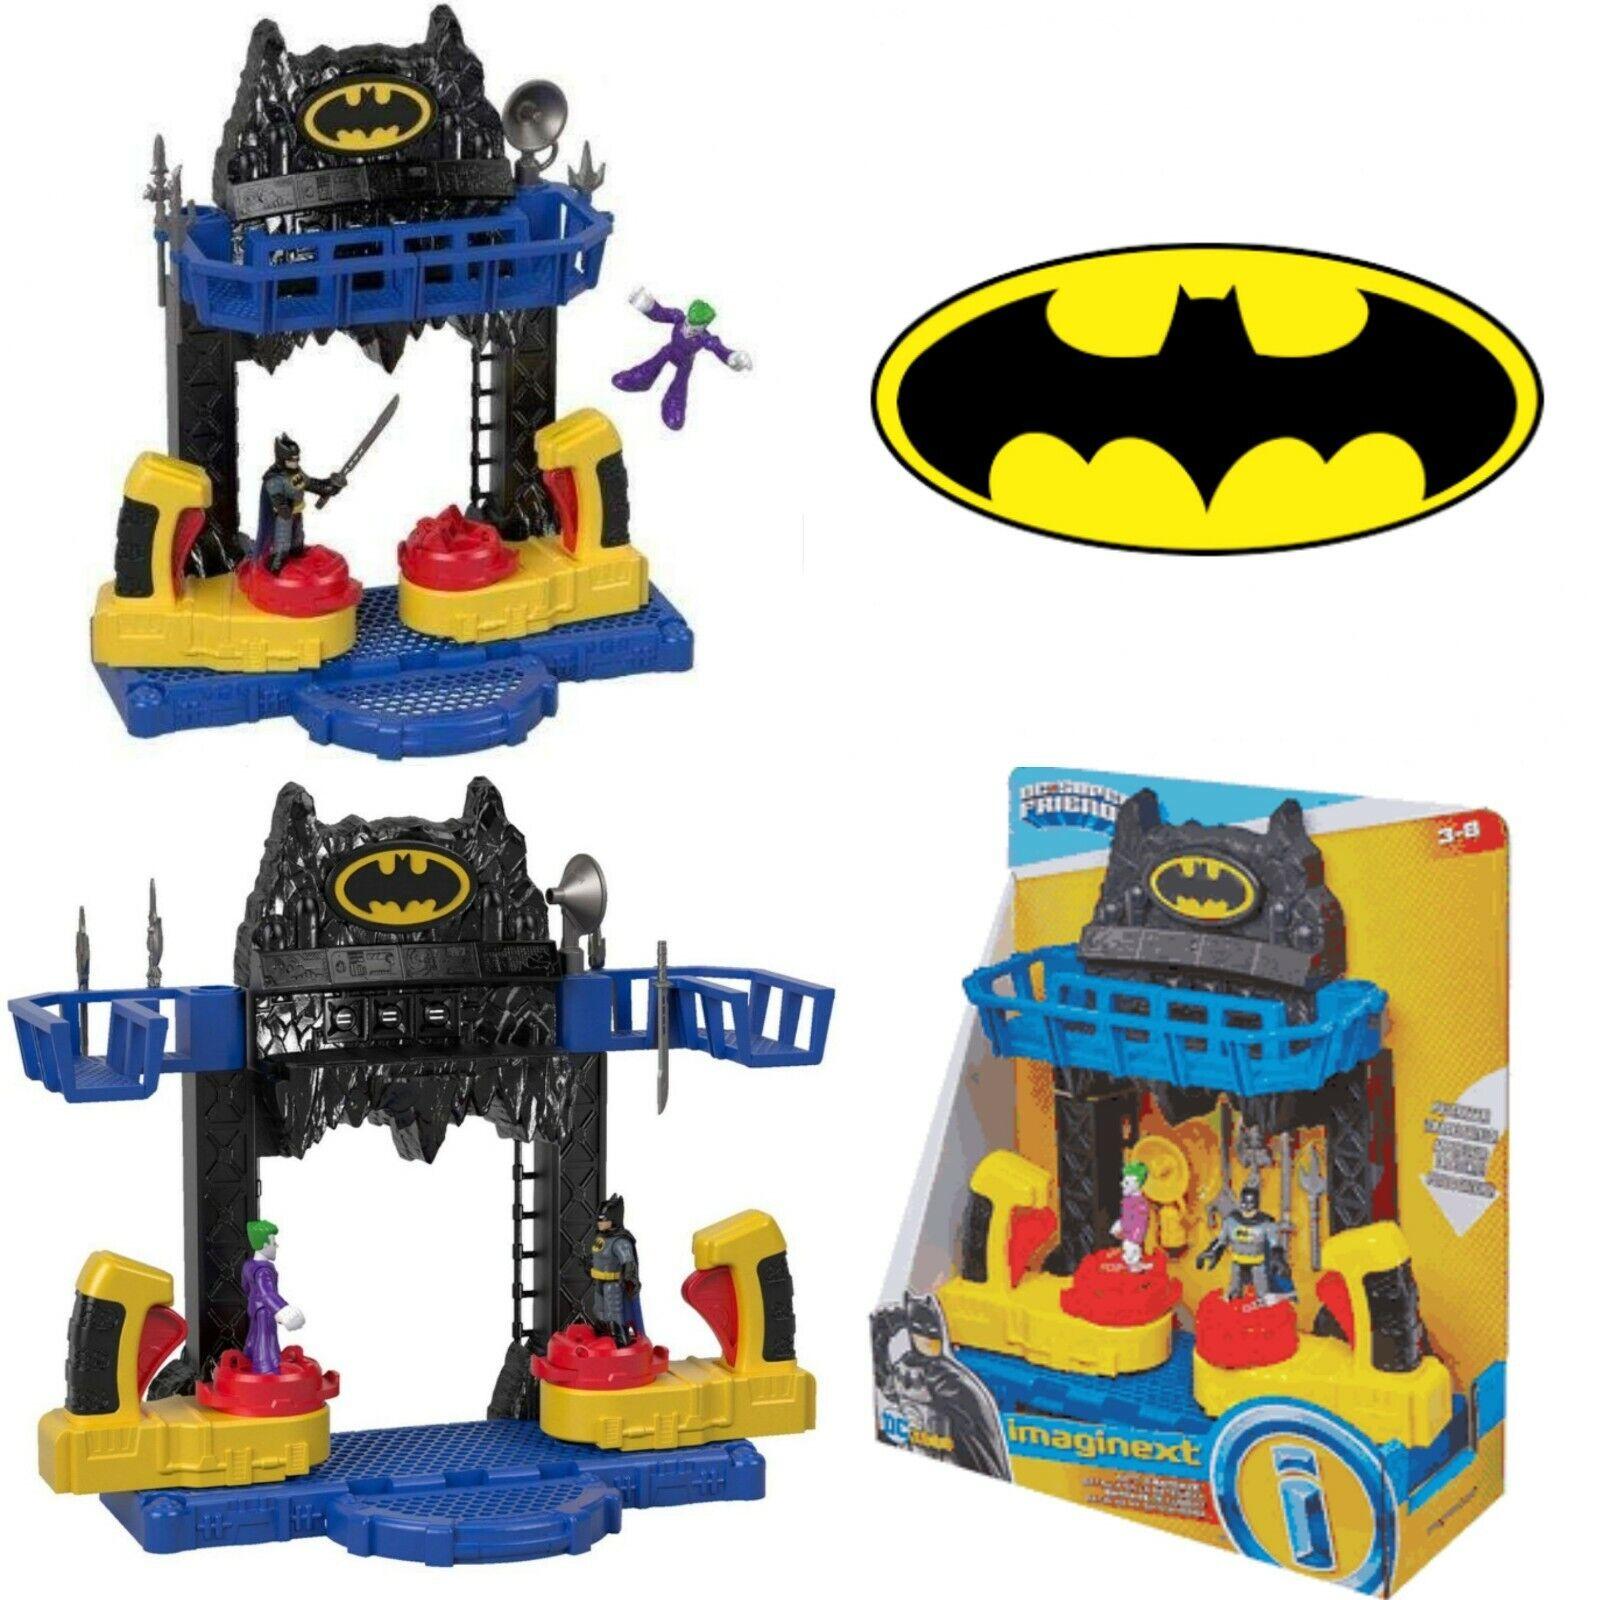 Imaginext FKW12 BATTAGLIA Bat-Caverna con figure di Batman Joker +4 pezzi aggiuntivi